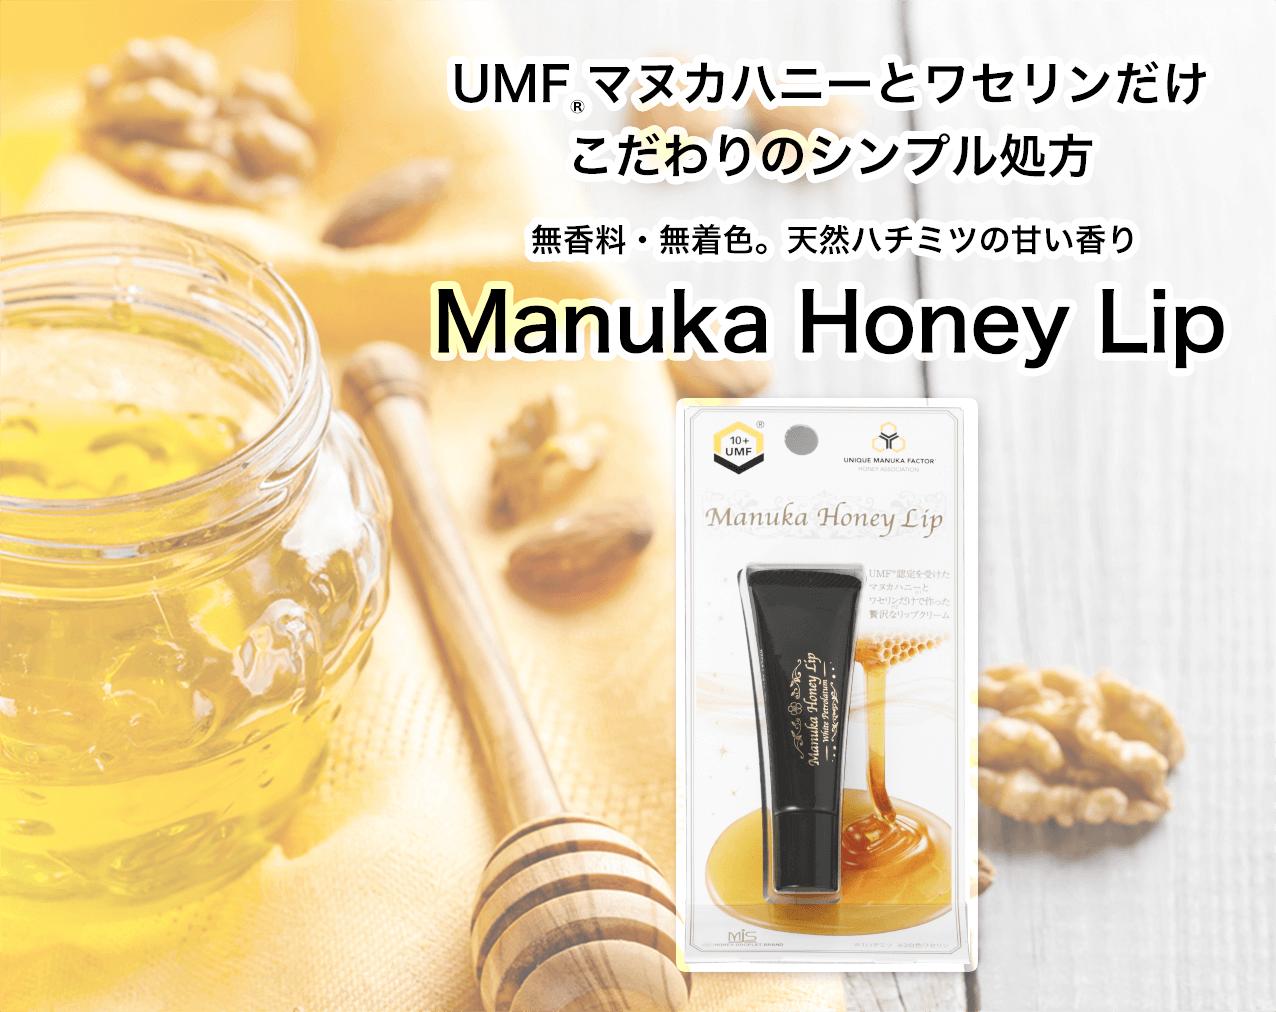 UMF(R)マヌカハニーとワセリンだけ こだわりのシンプル処方 無香料・無着色。天然ハチミツの甘い香り Manuka Honey Lip